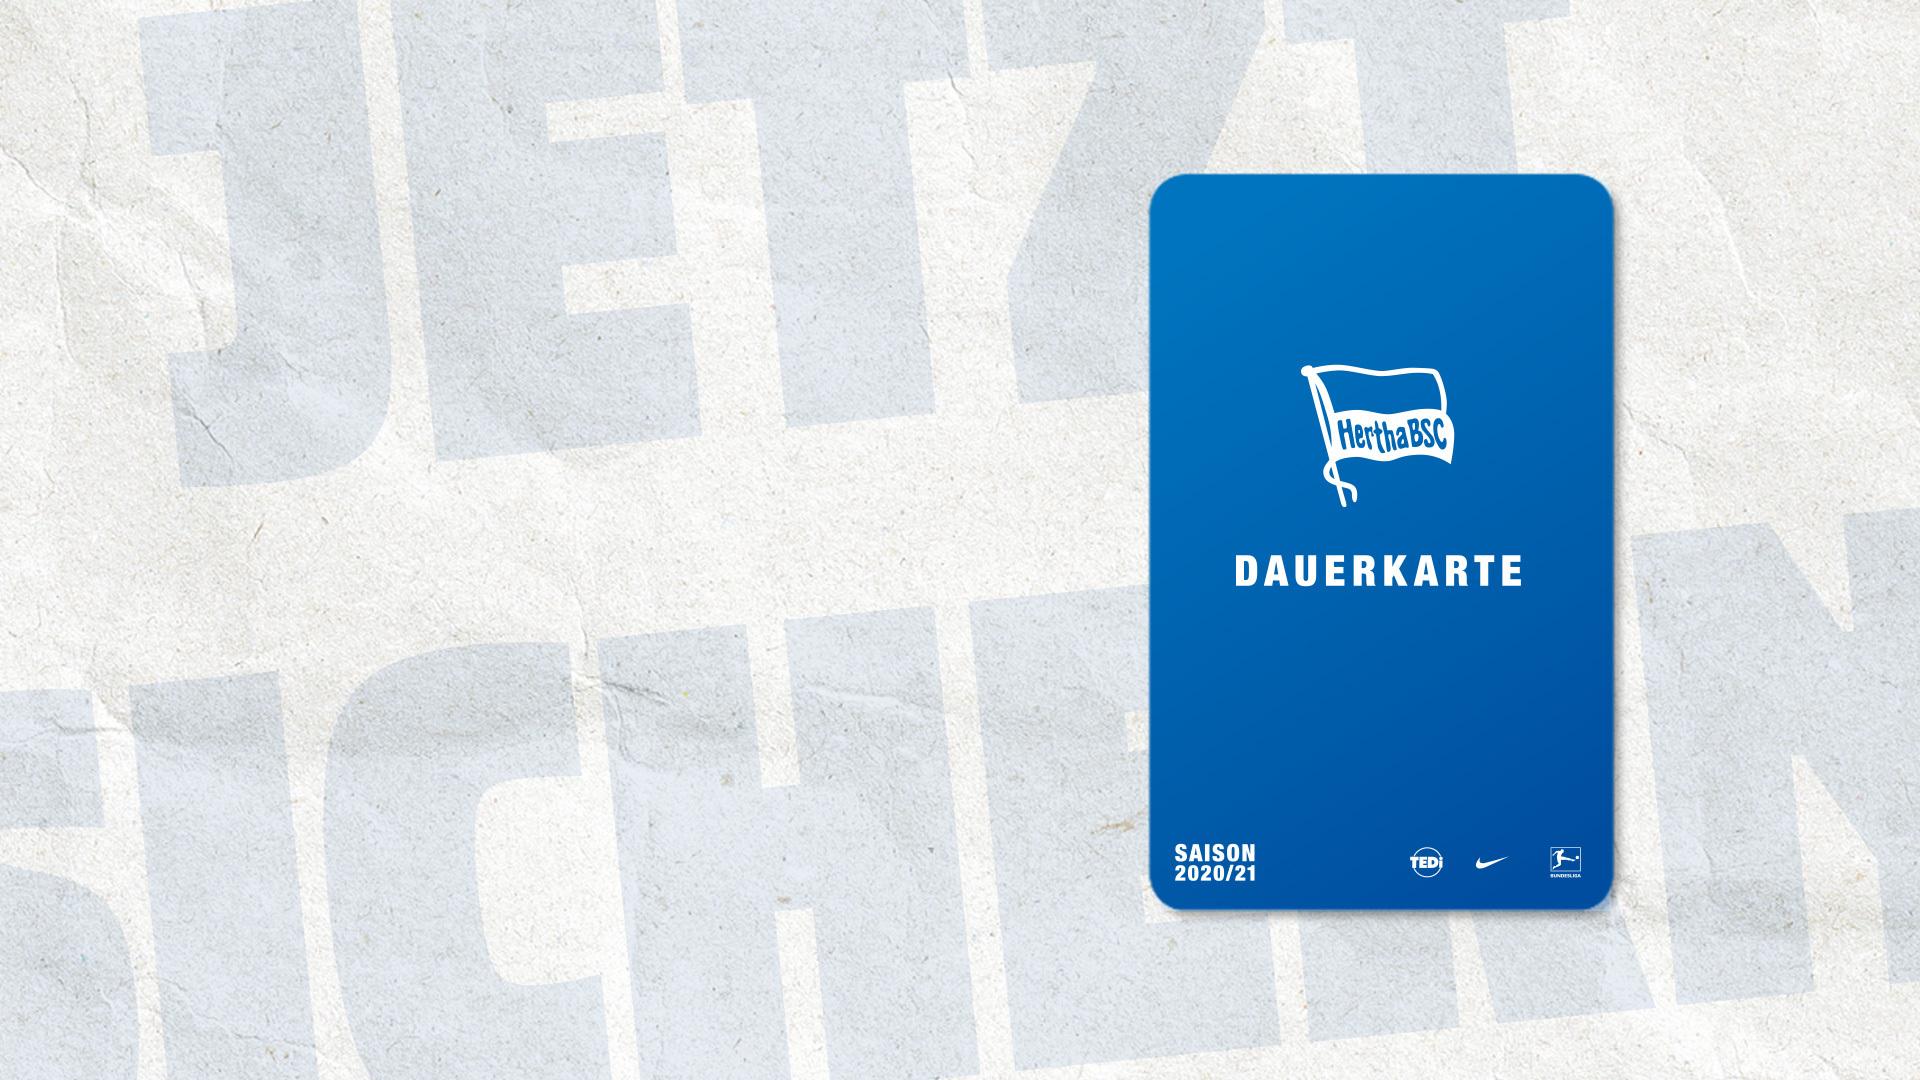 Das Logo der Sammler-Dauerkarte